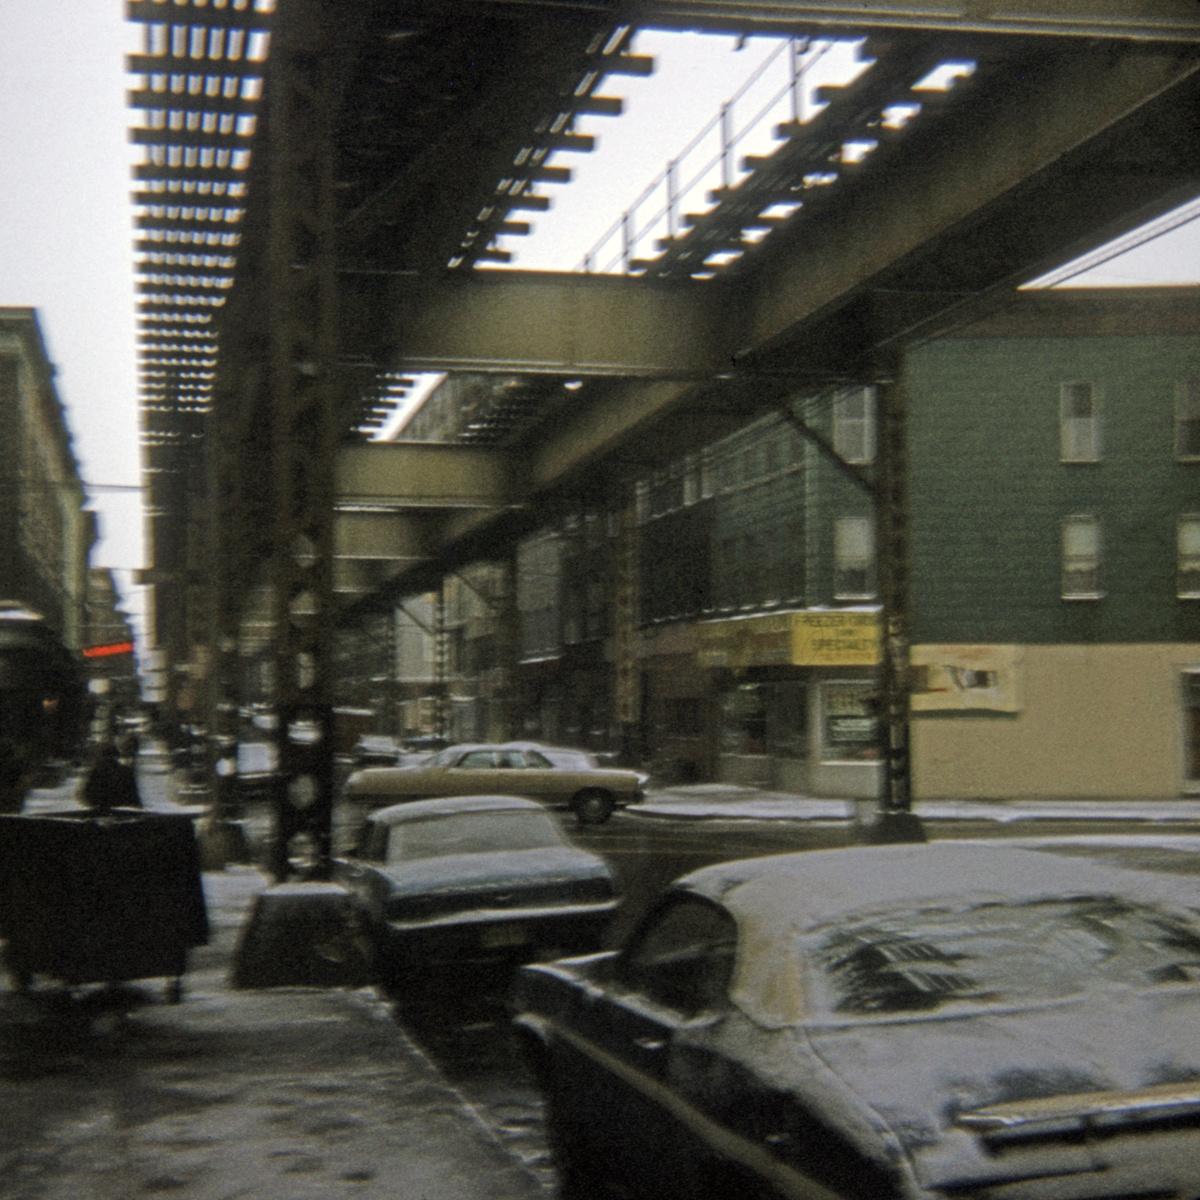 (611k, 1200x1200)<br><b>Country:</b> United States<br><b>City:</b> New York<br><b>System:</b> New York City Transit<br><b>Line:</b> BMT Nassau Street-Jamaica Line<br><b>Location:</b> Norwood Avenue<br><b>Photo by:</b> Ed Davis, Sr.<br><b>Collection of:</b> David Pirmann<br><b>Viewed (this week/total):</b> 0 / 3163